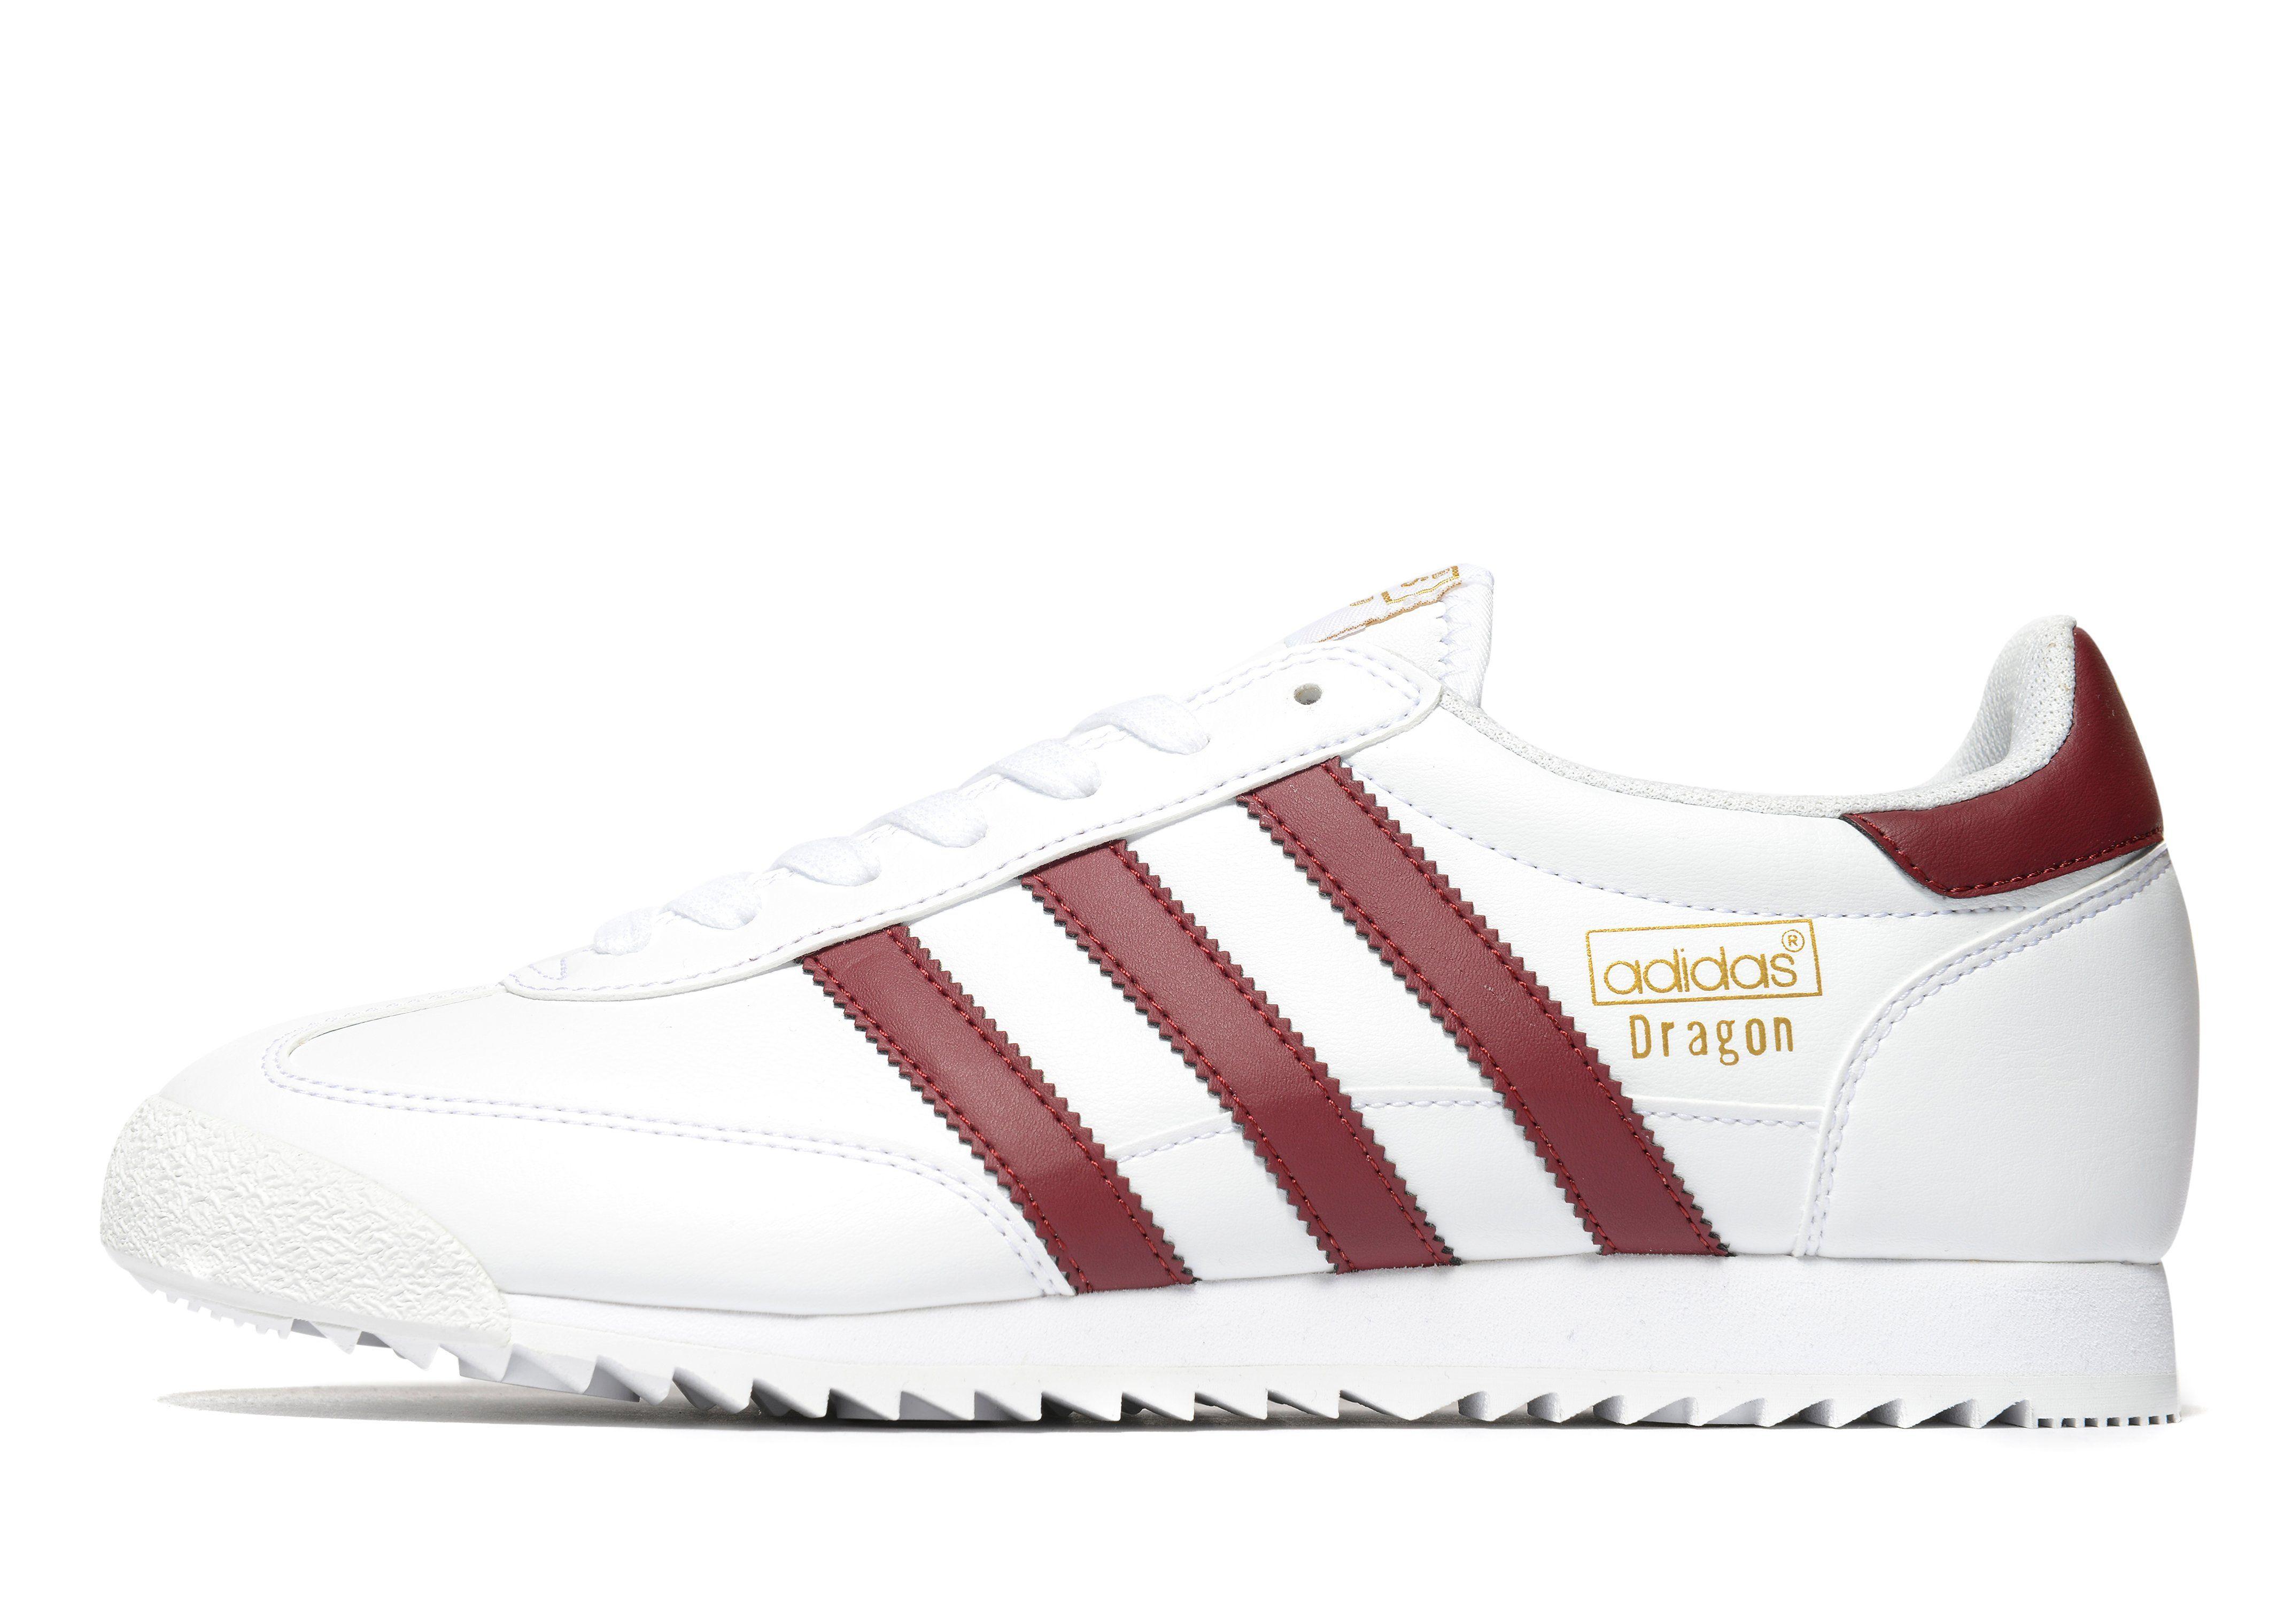 adidas dragon shoes jd